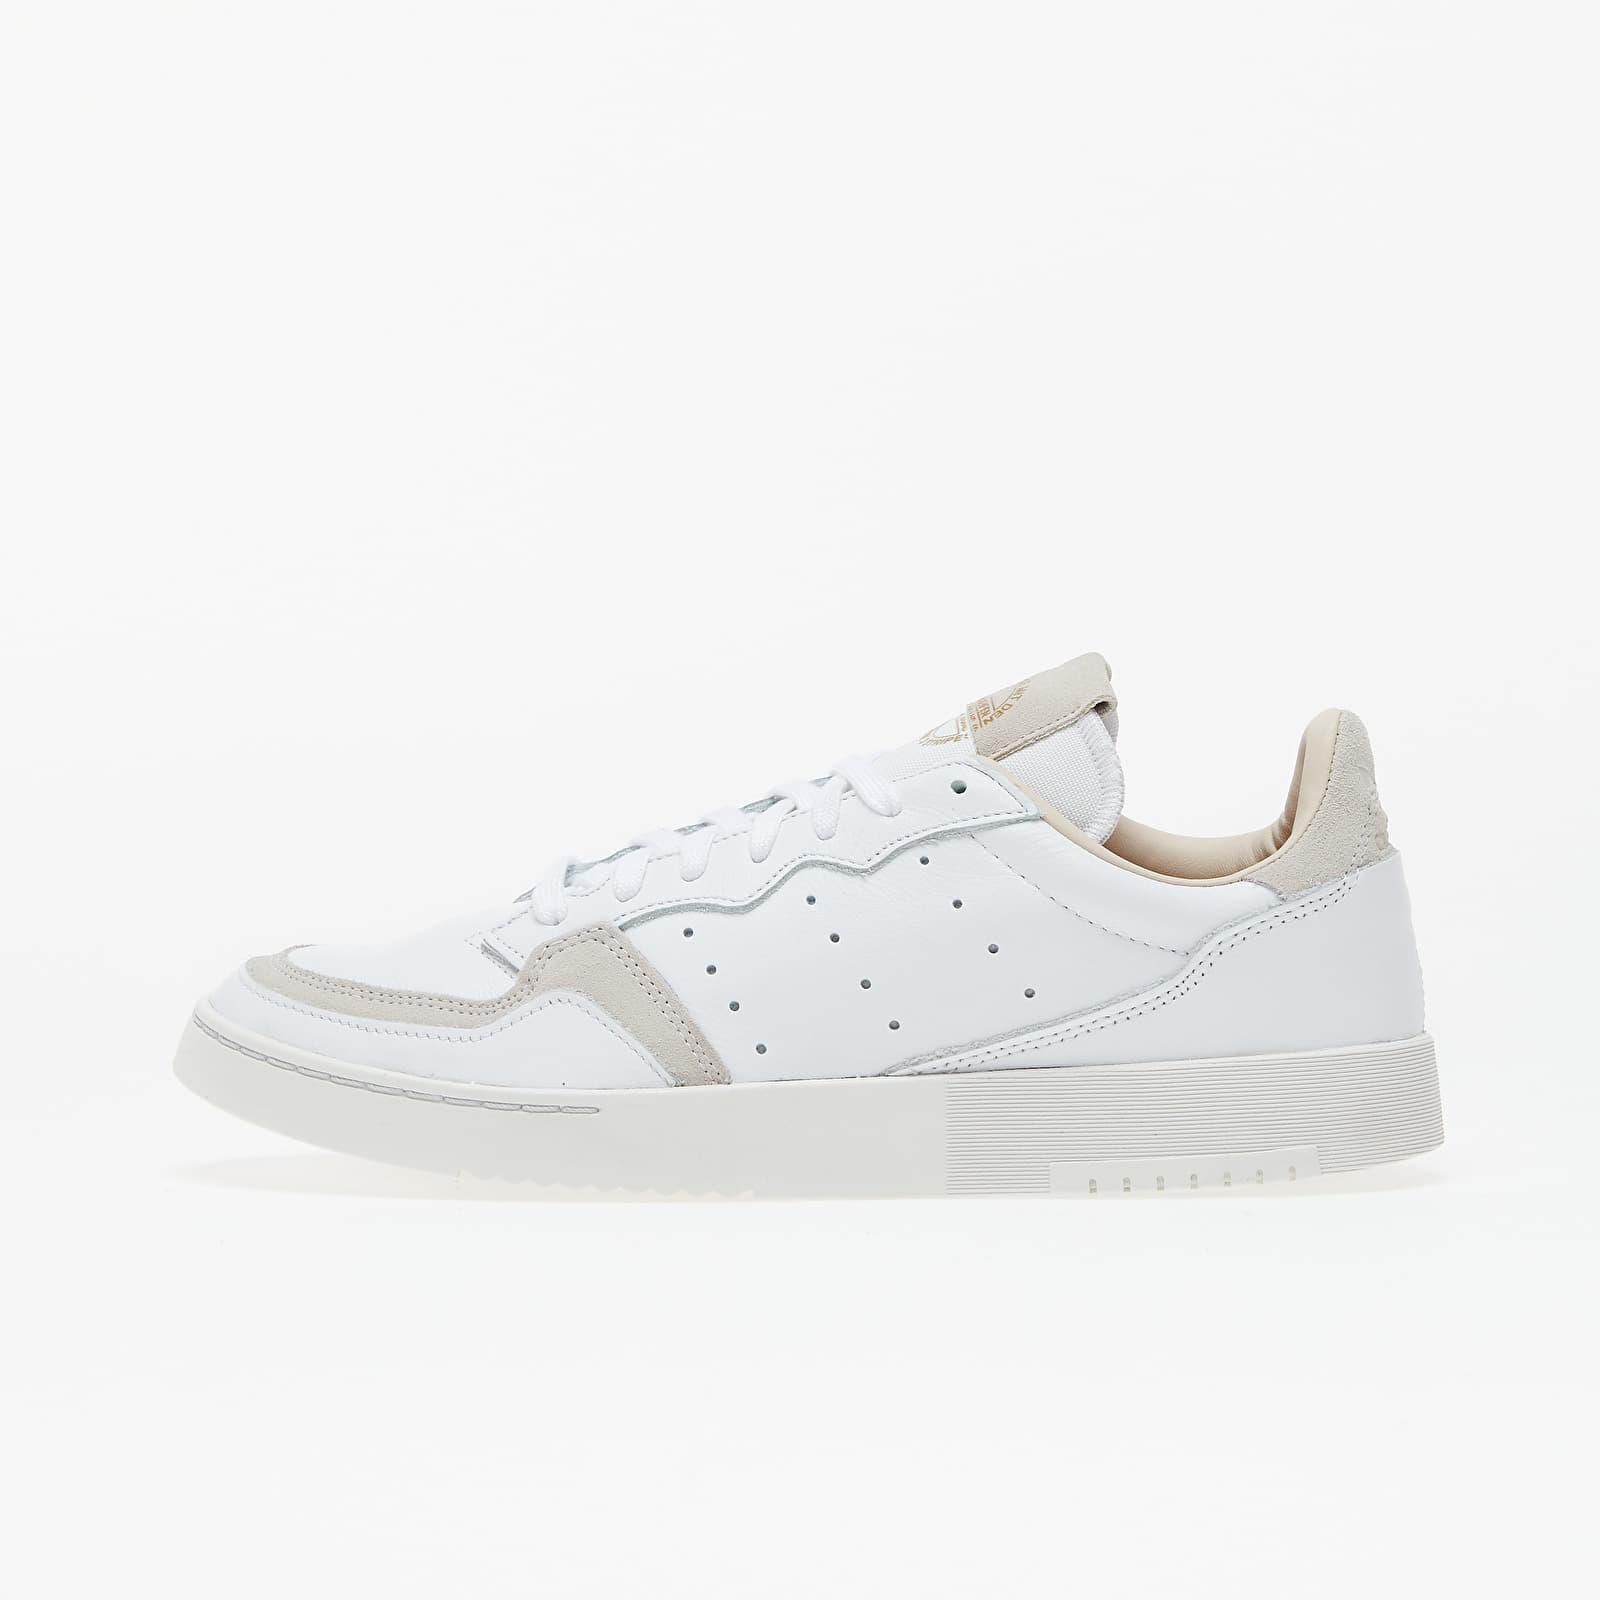 Muške tenisice adidas Supercourt Ftw White/ Ftw White/ Crystal White